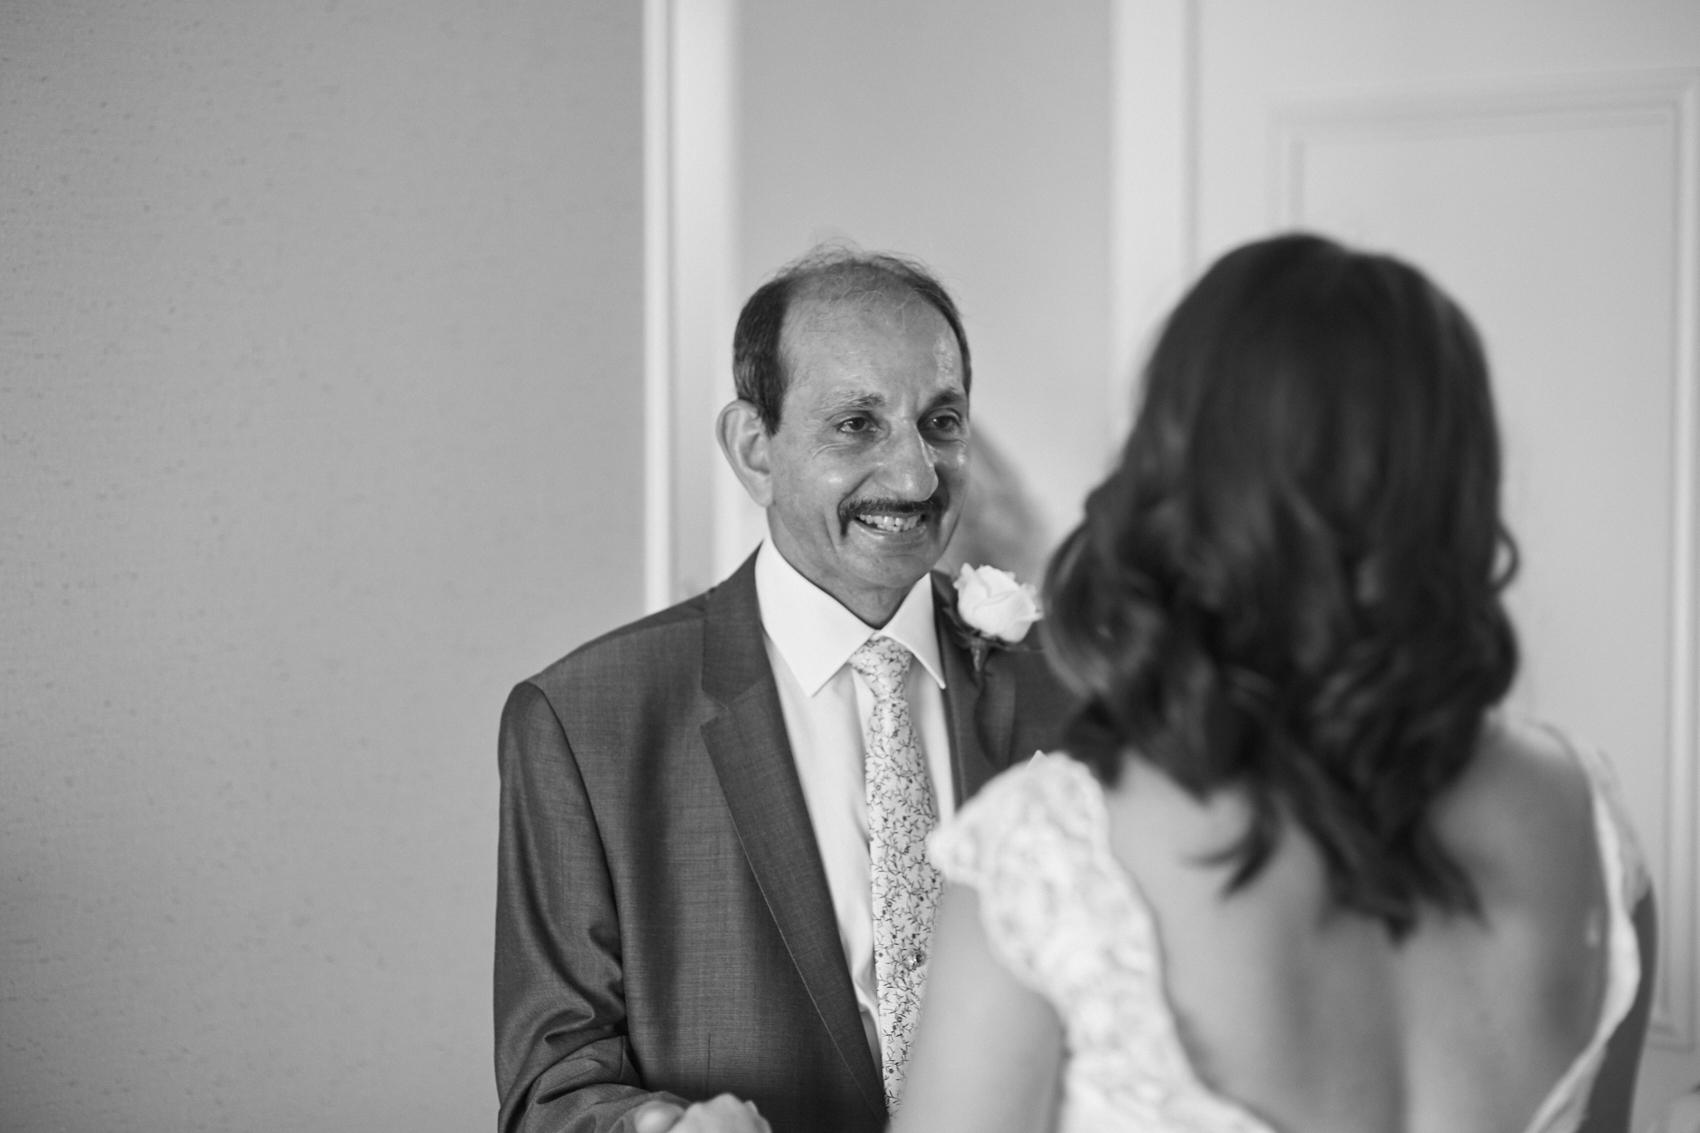 Emotional dad with bride